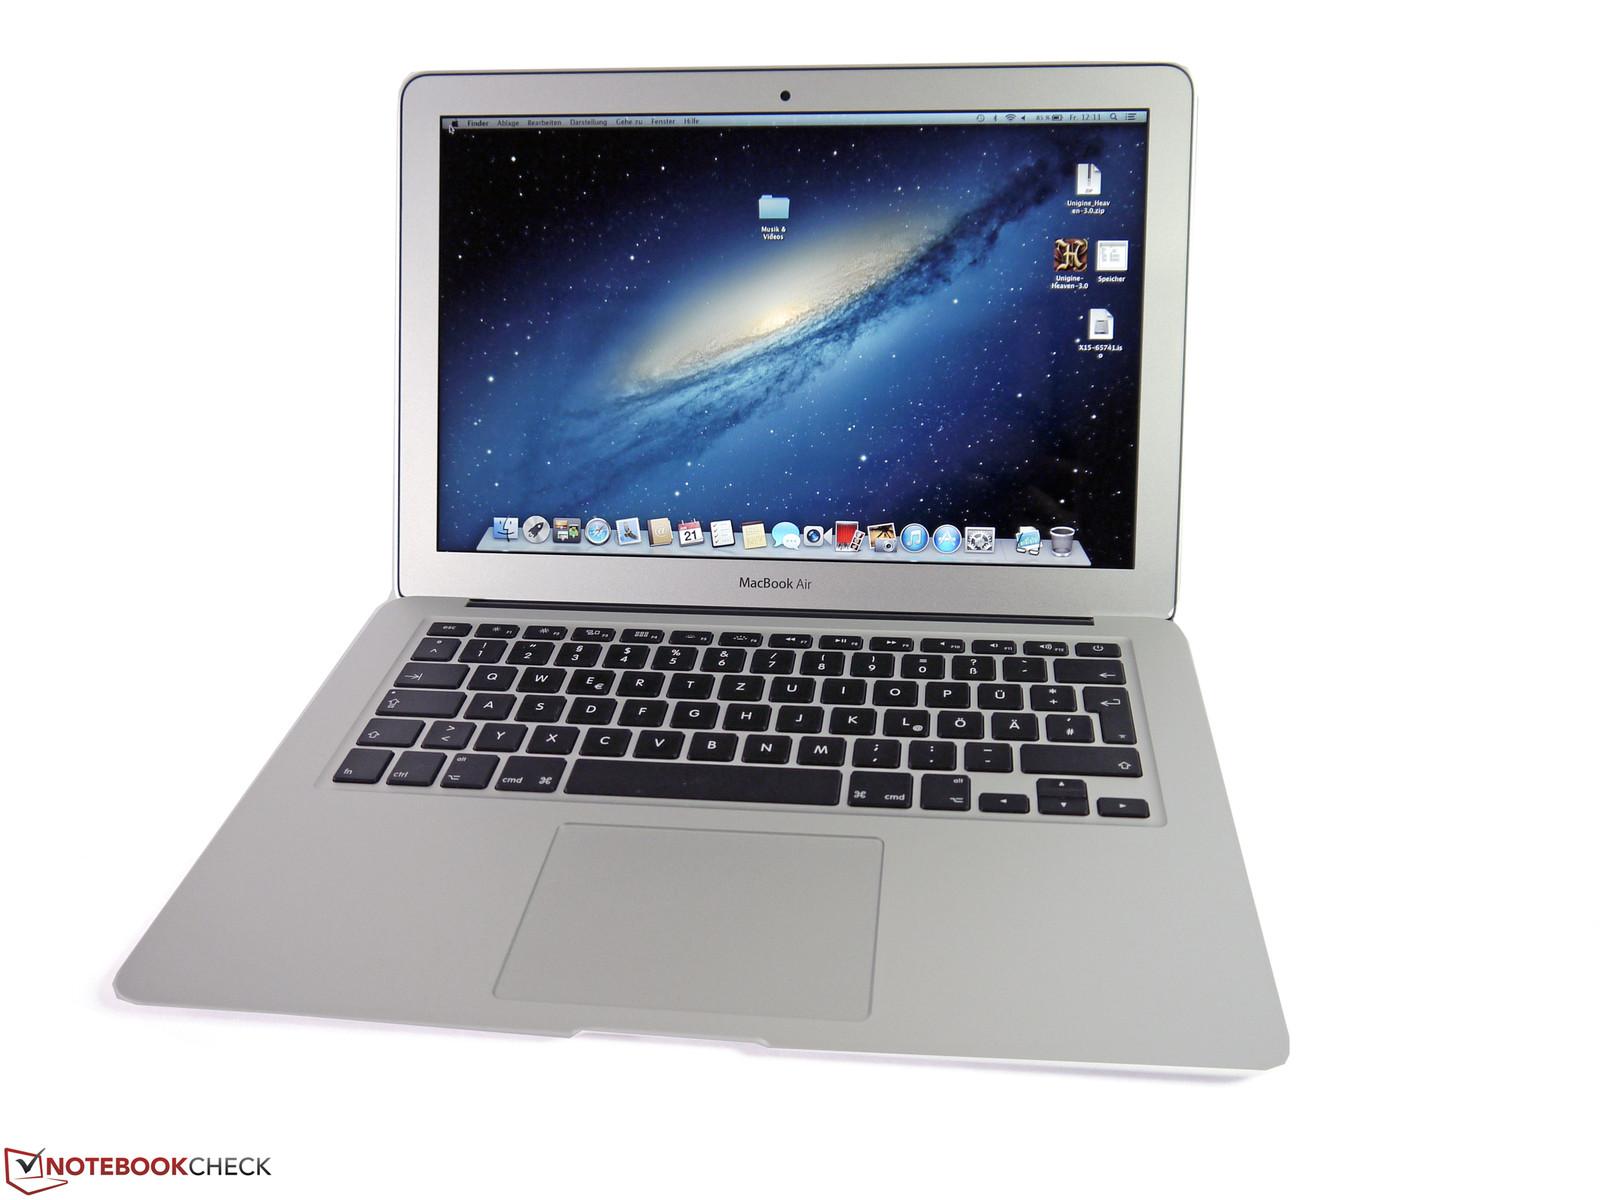 apple macbook air 13 md761d b 2014 06 notebook review. Black Bedroom Furniture Sets. Home Design Ideas